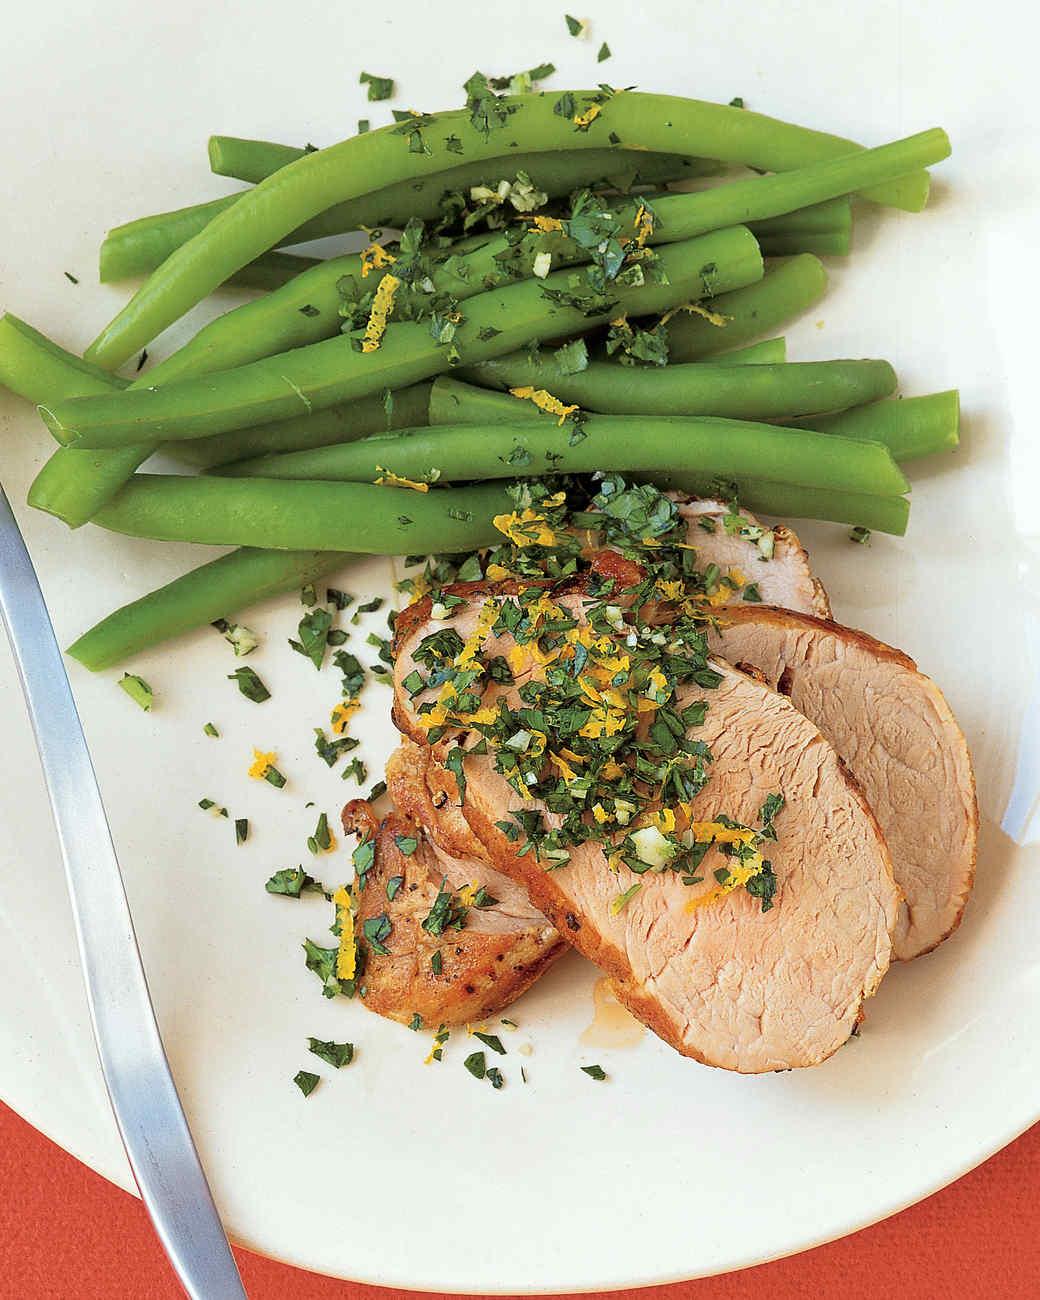 Pork Tenderloin with Orange-Parsley Topping